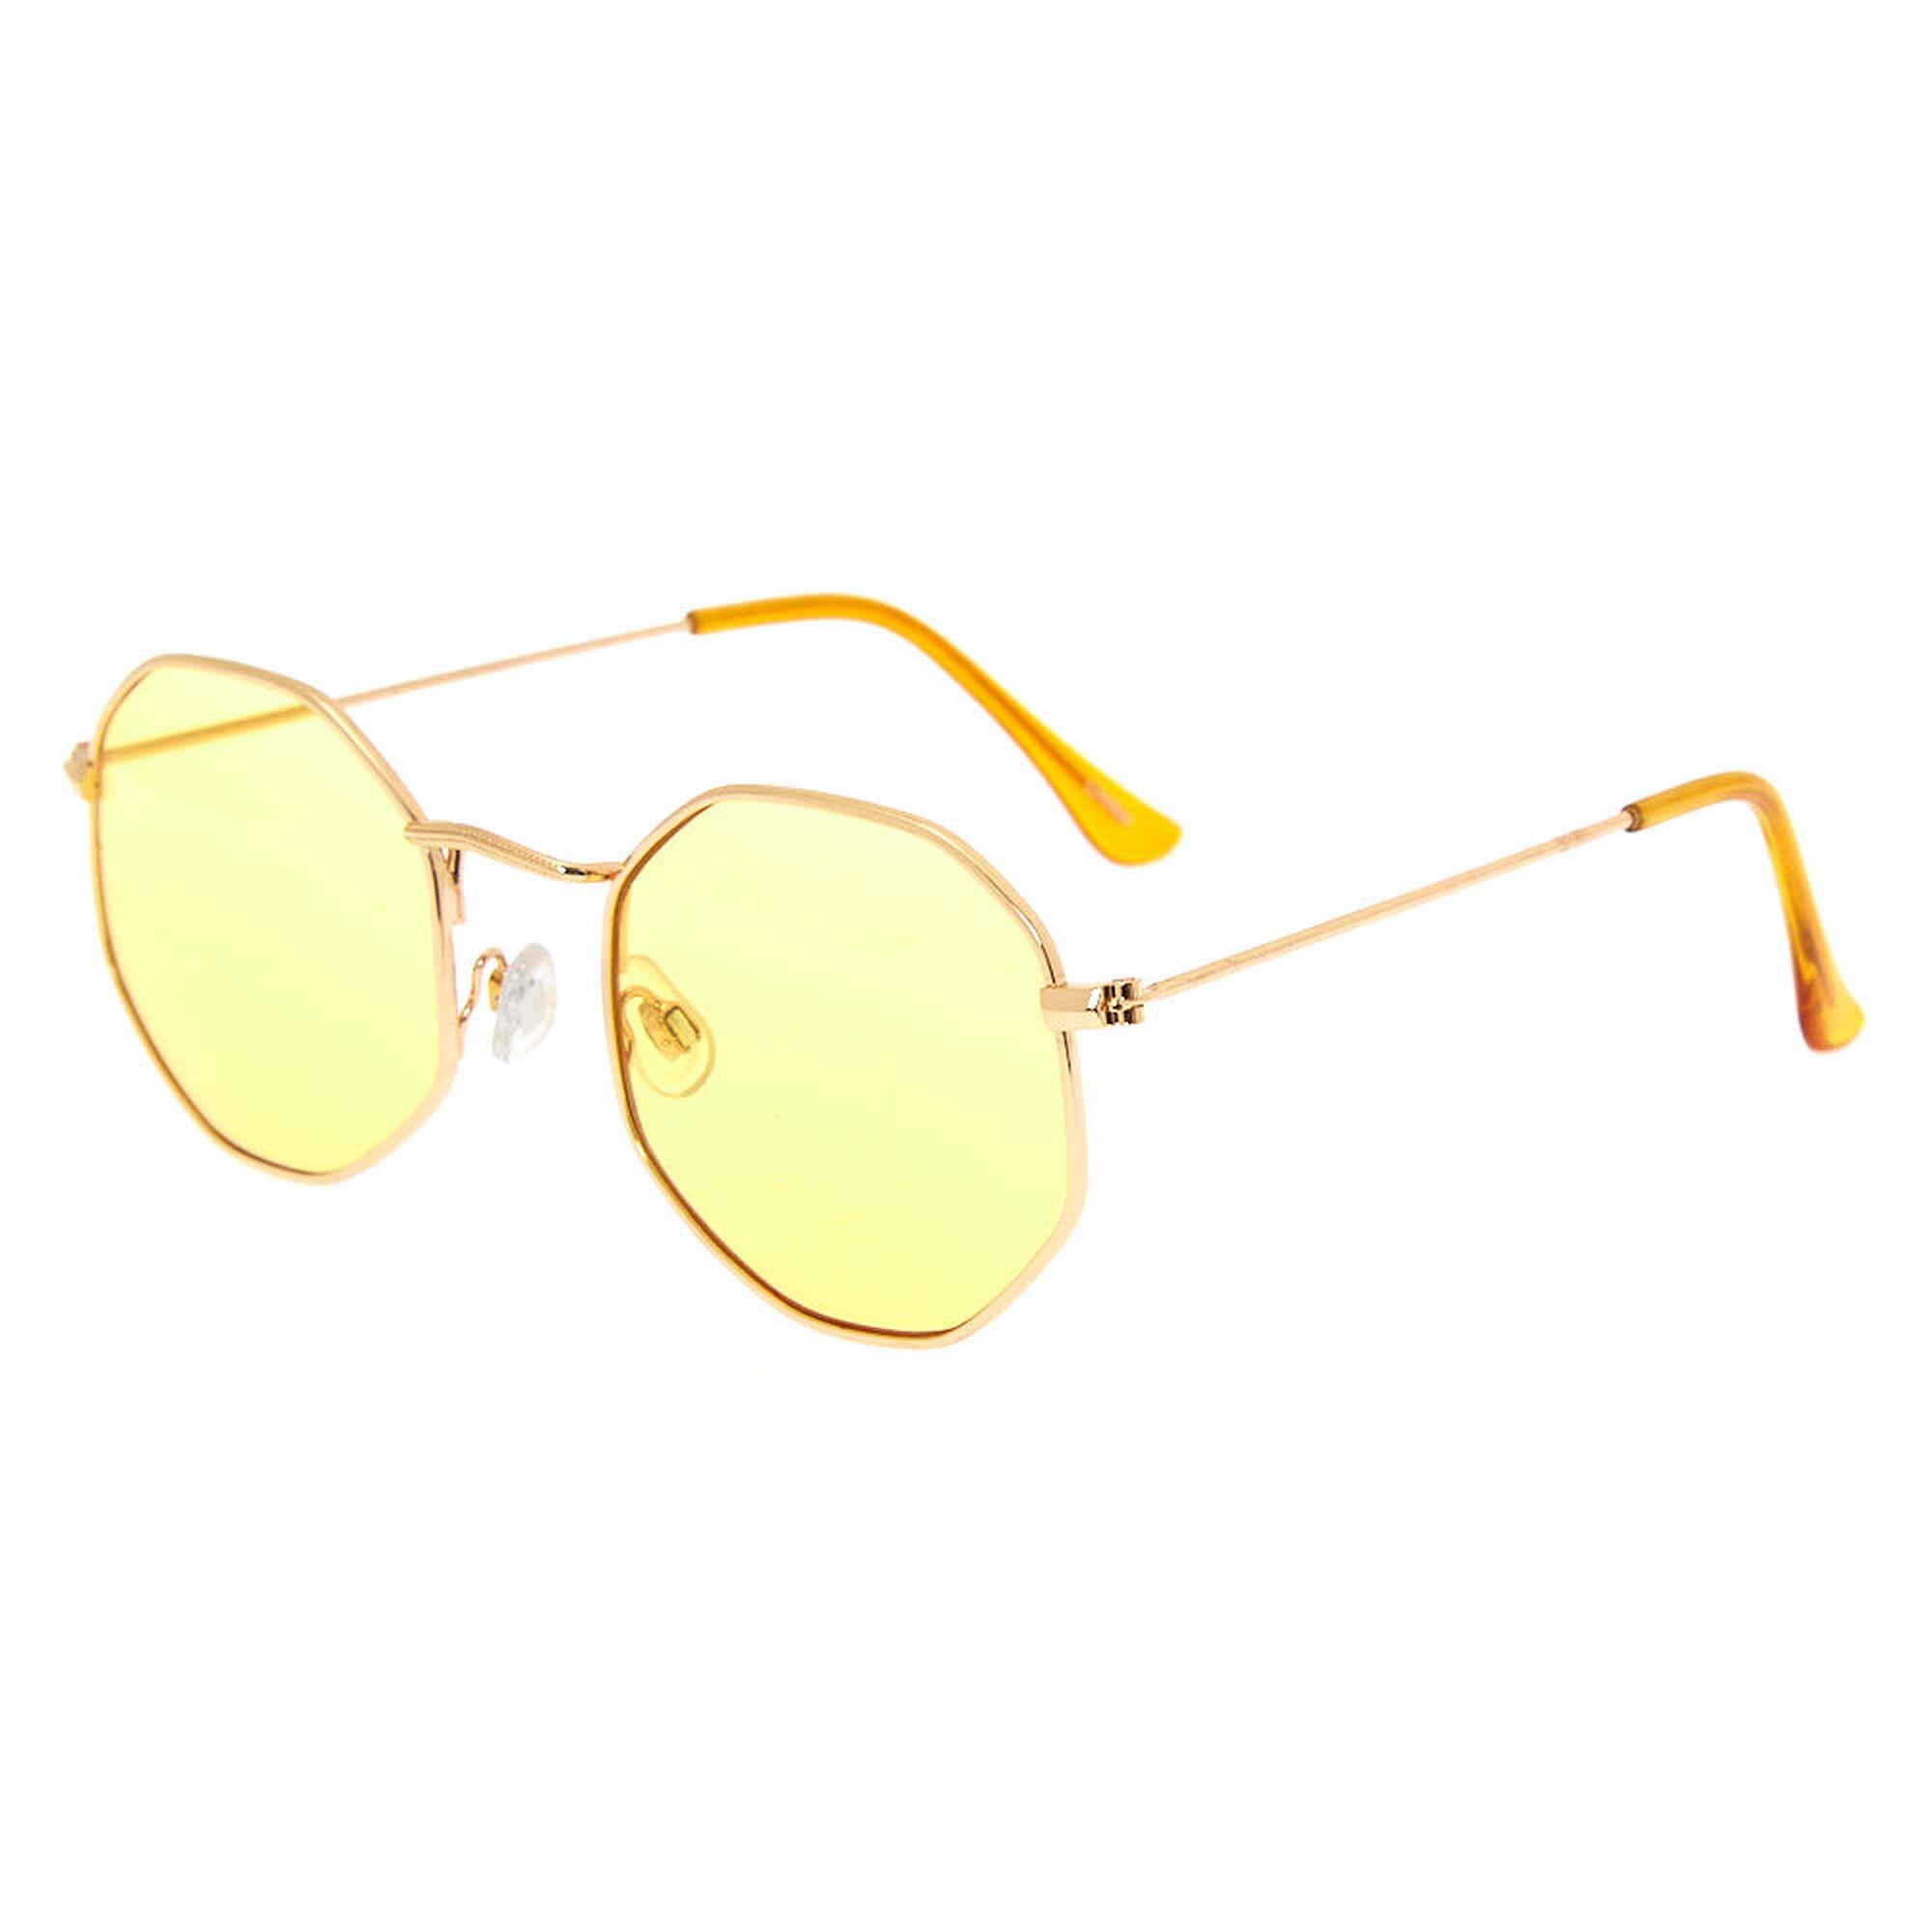 a57038c4a70 Octagonal Sunglasses - Yellow ...